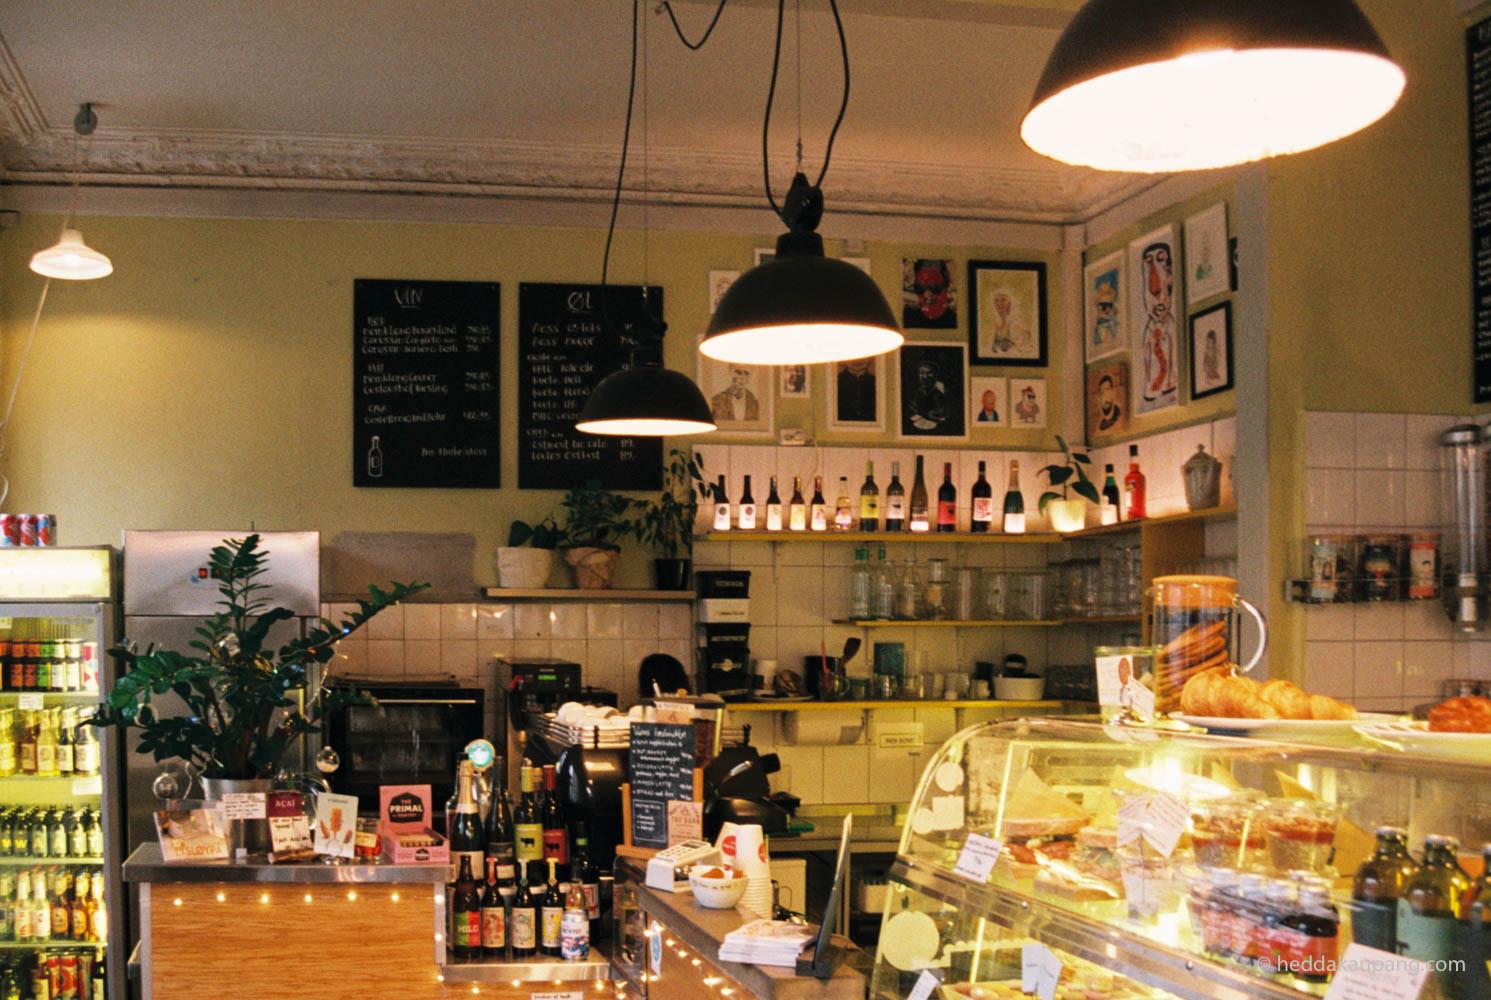 Liebling kafe i Oslo